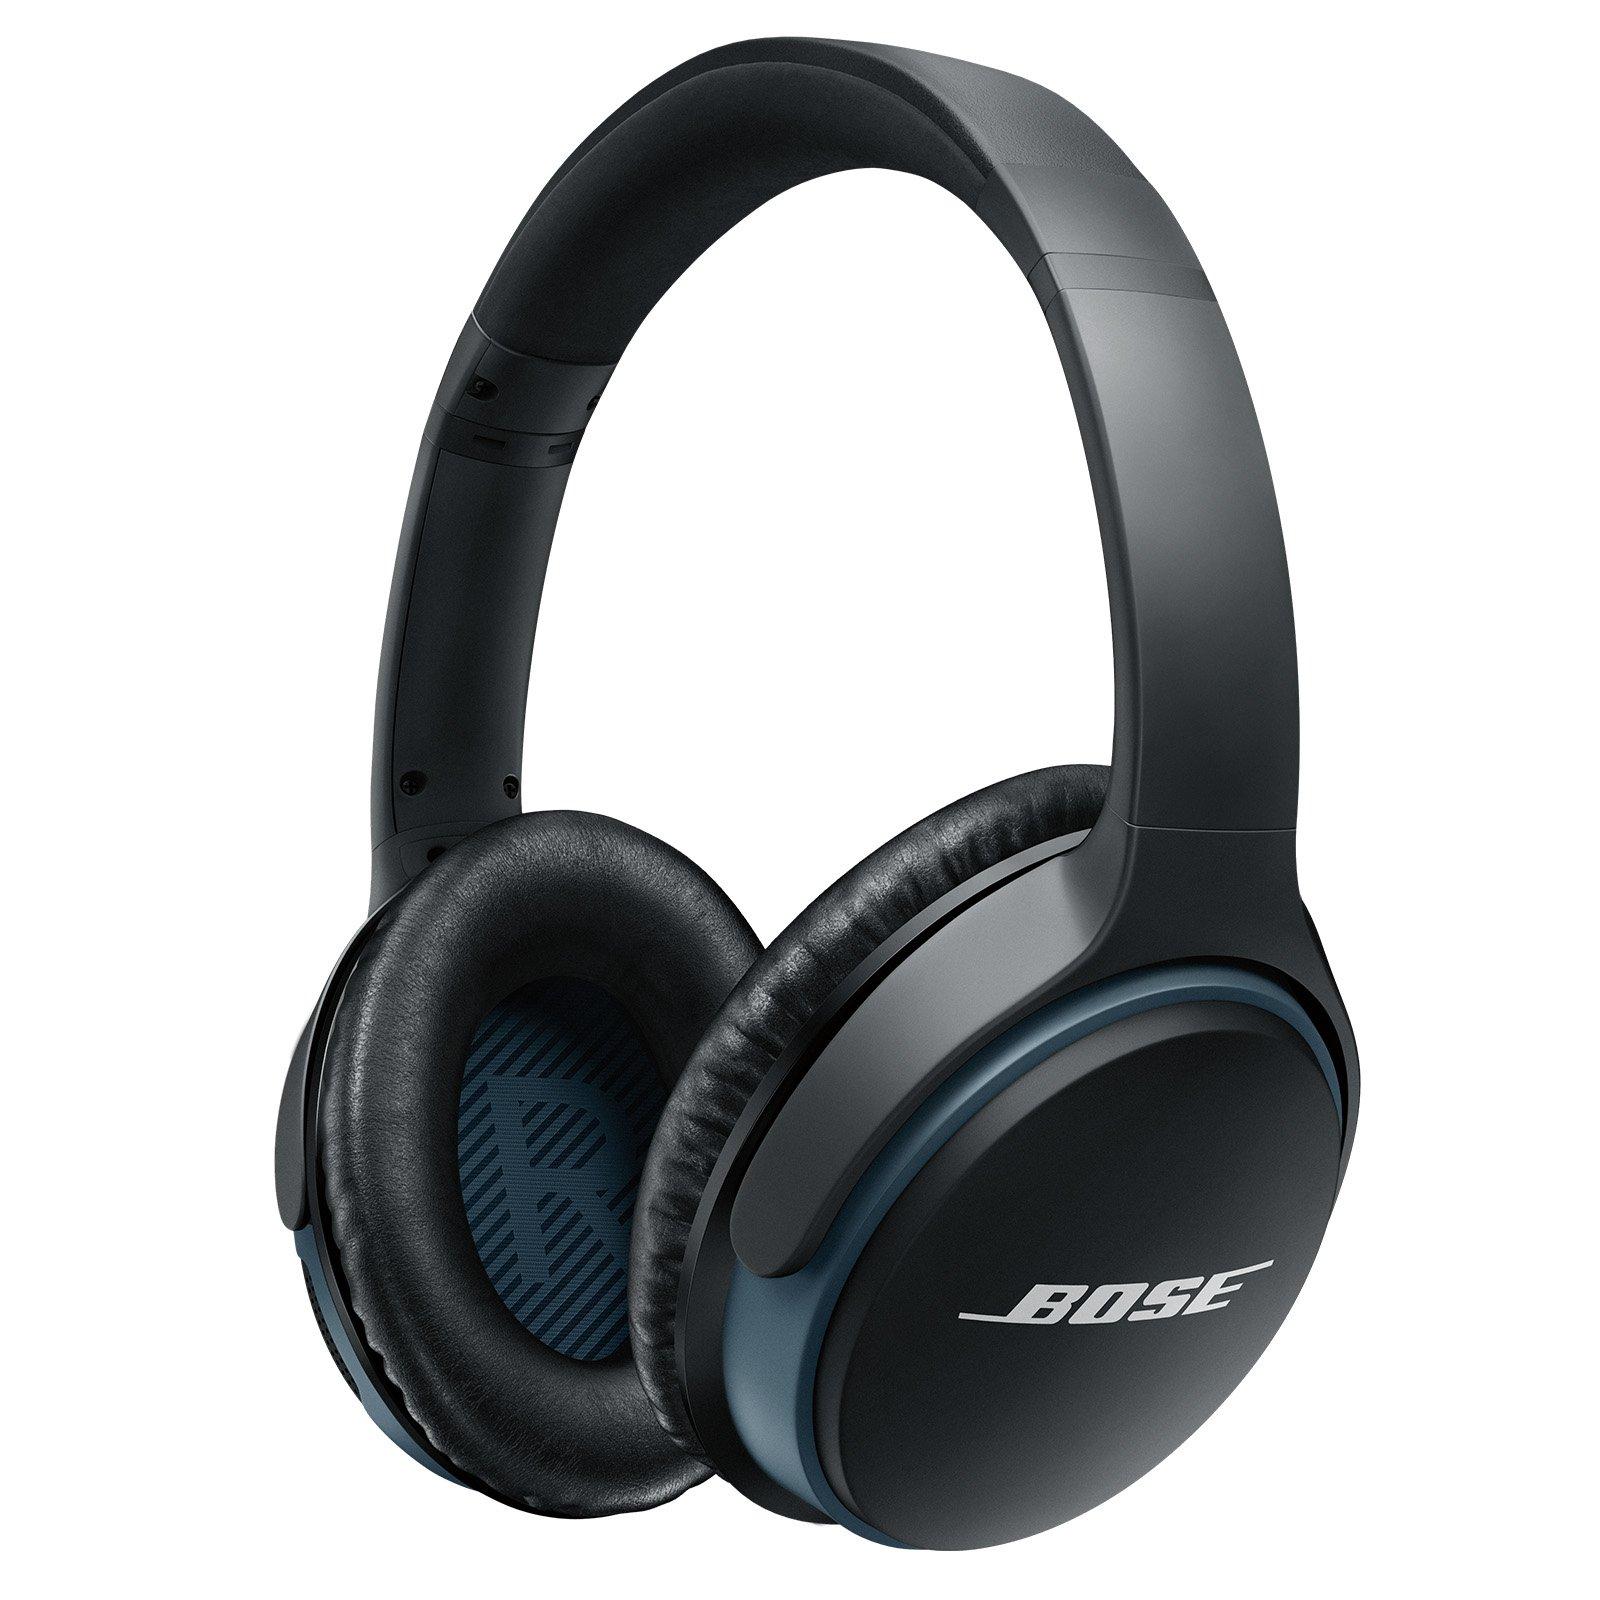 Bose SoundLink Around Ear Wireless Headphones II - Black by Bose